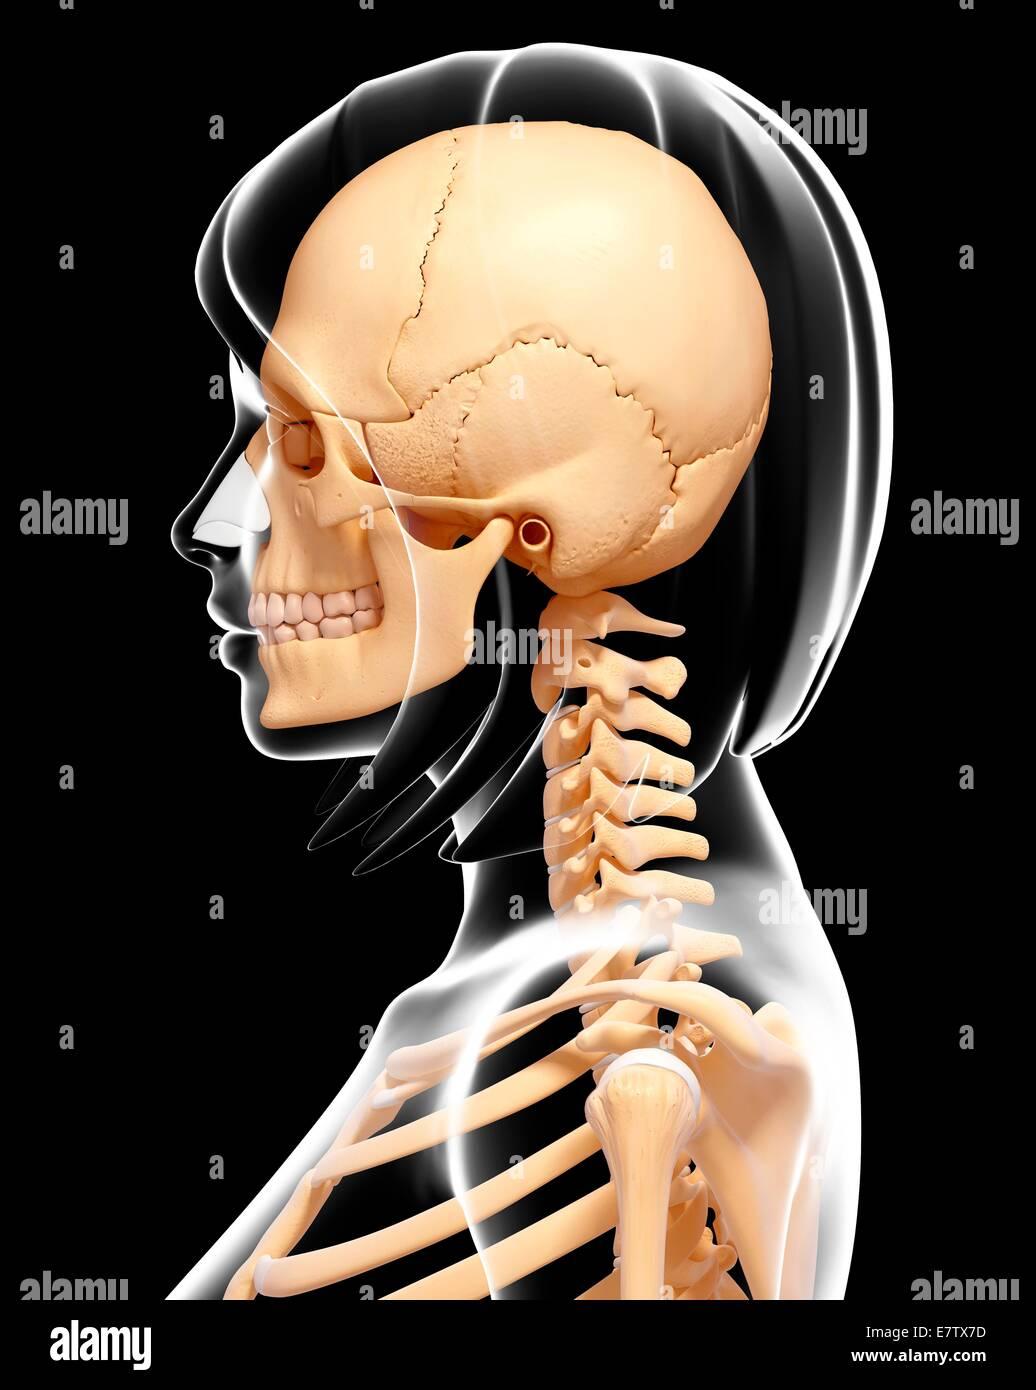 Human Skull And Neck Bones Computer Artwork Stock Photo 73691505